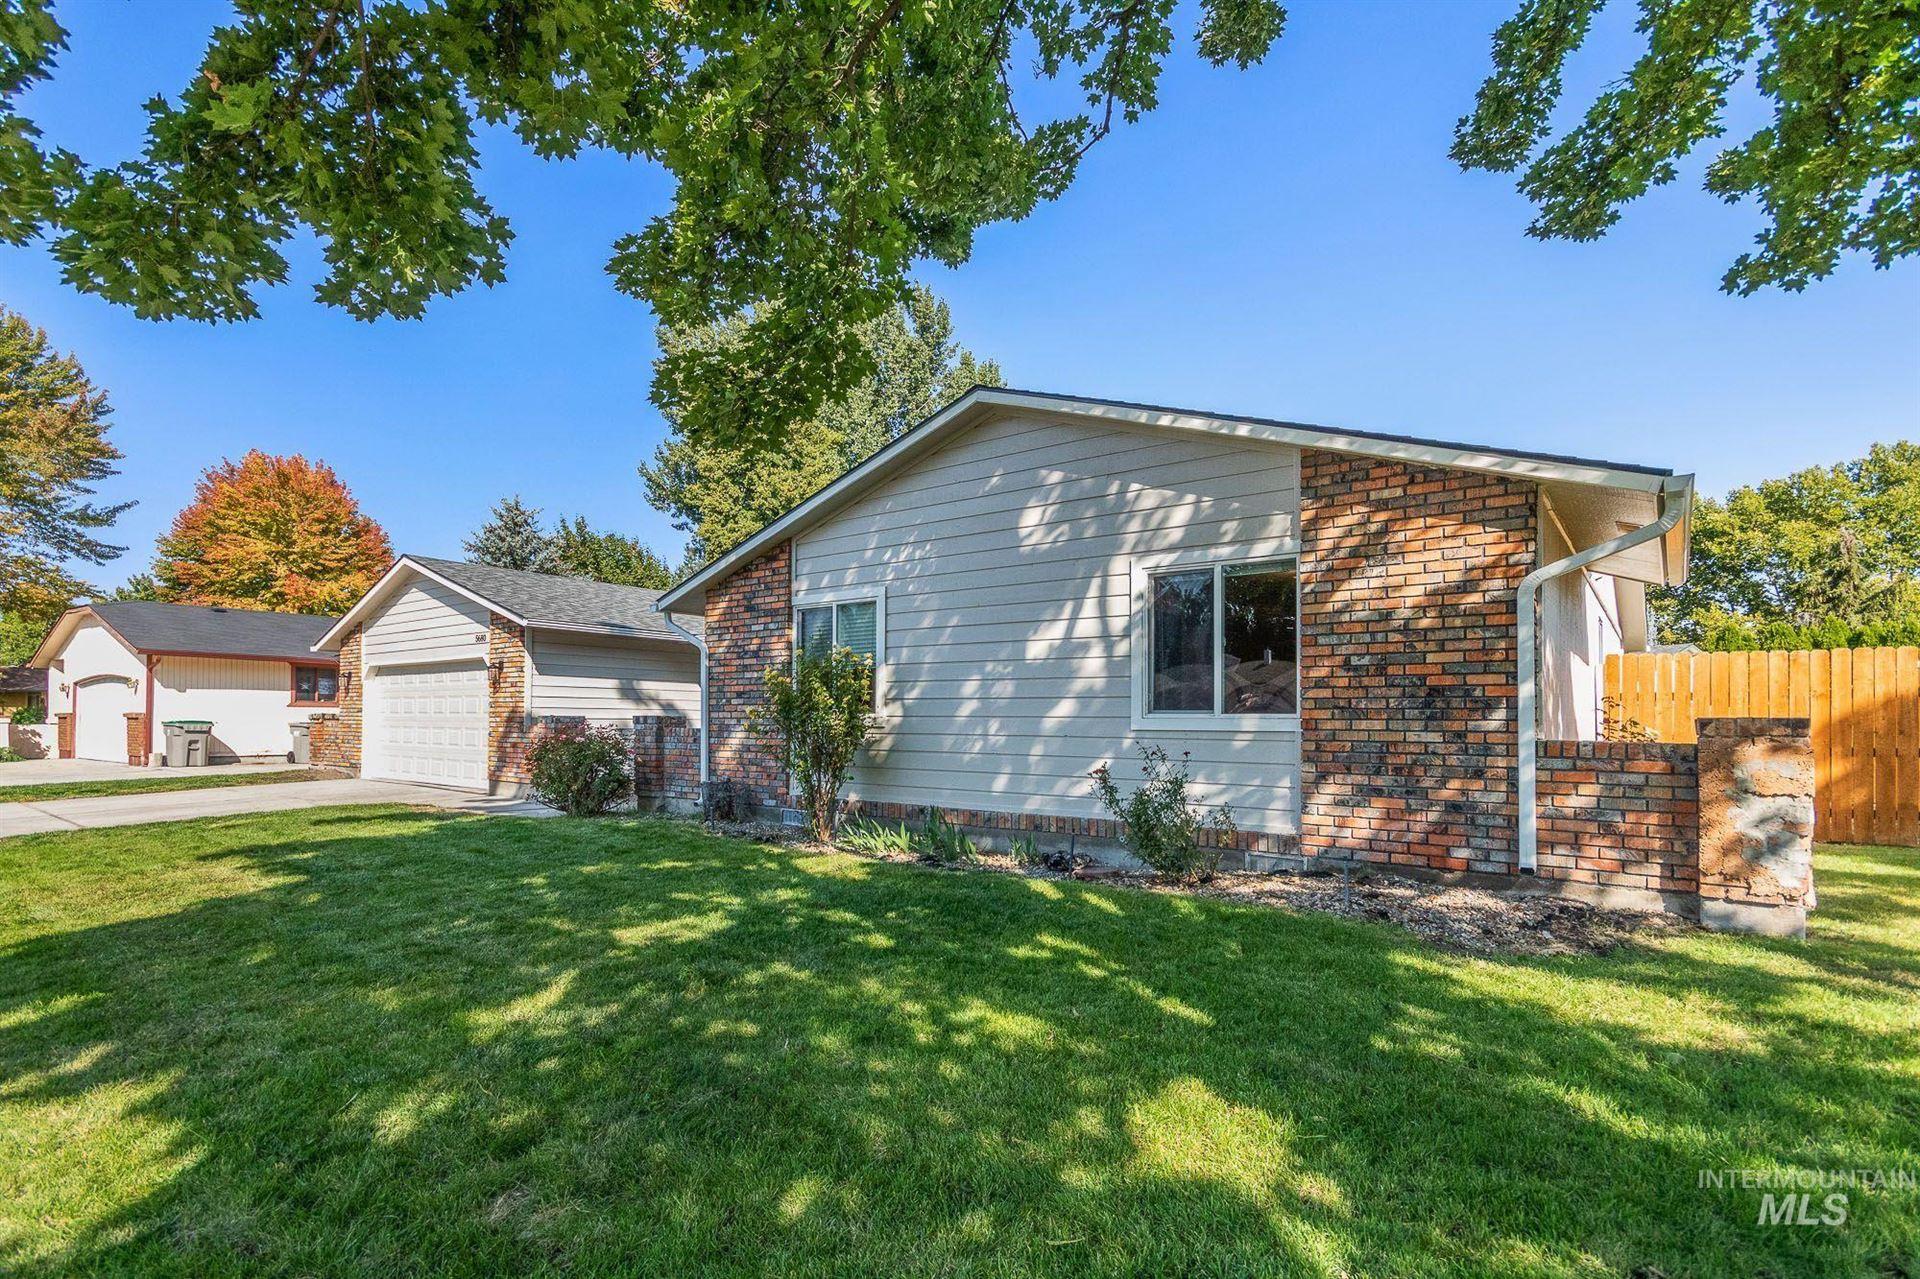 Photo of 5680 Peachtree, Boise, ID 83703 (MLS # 98819554)